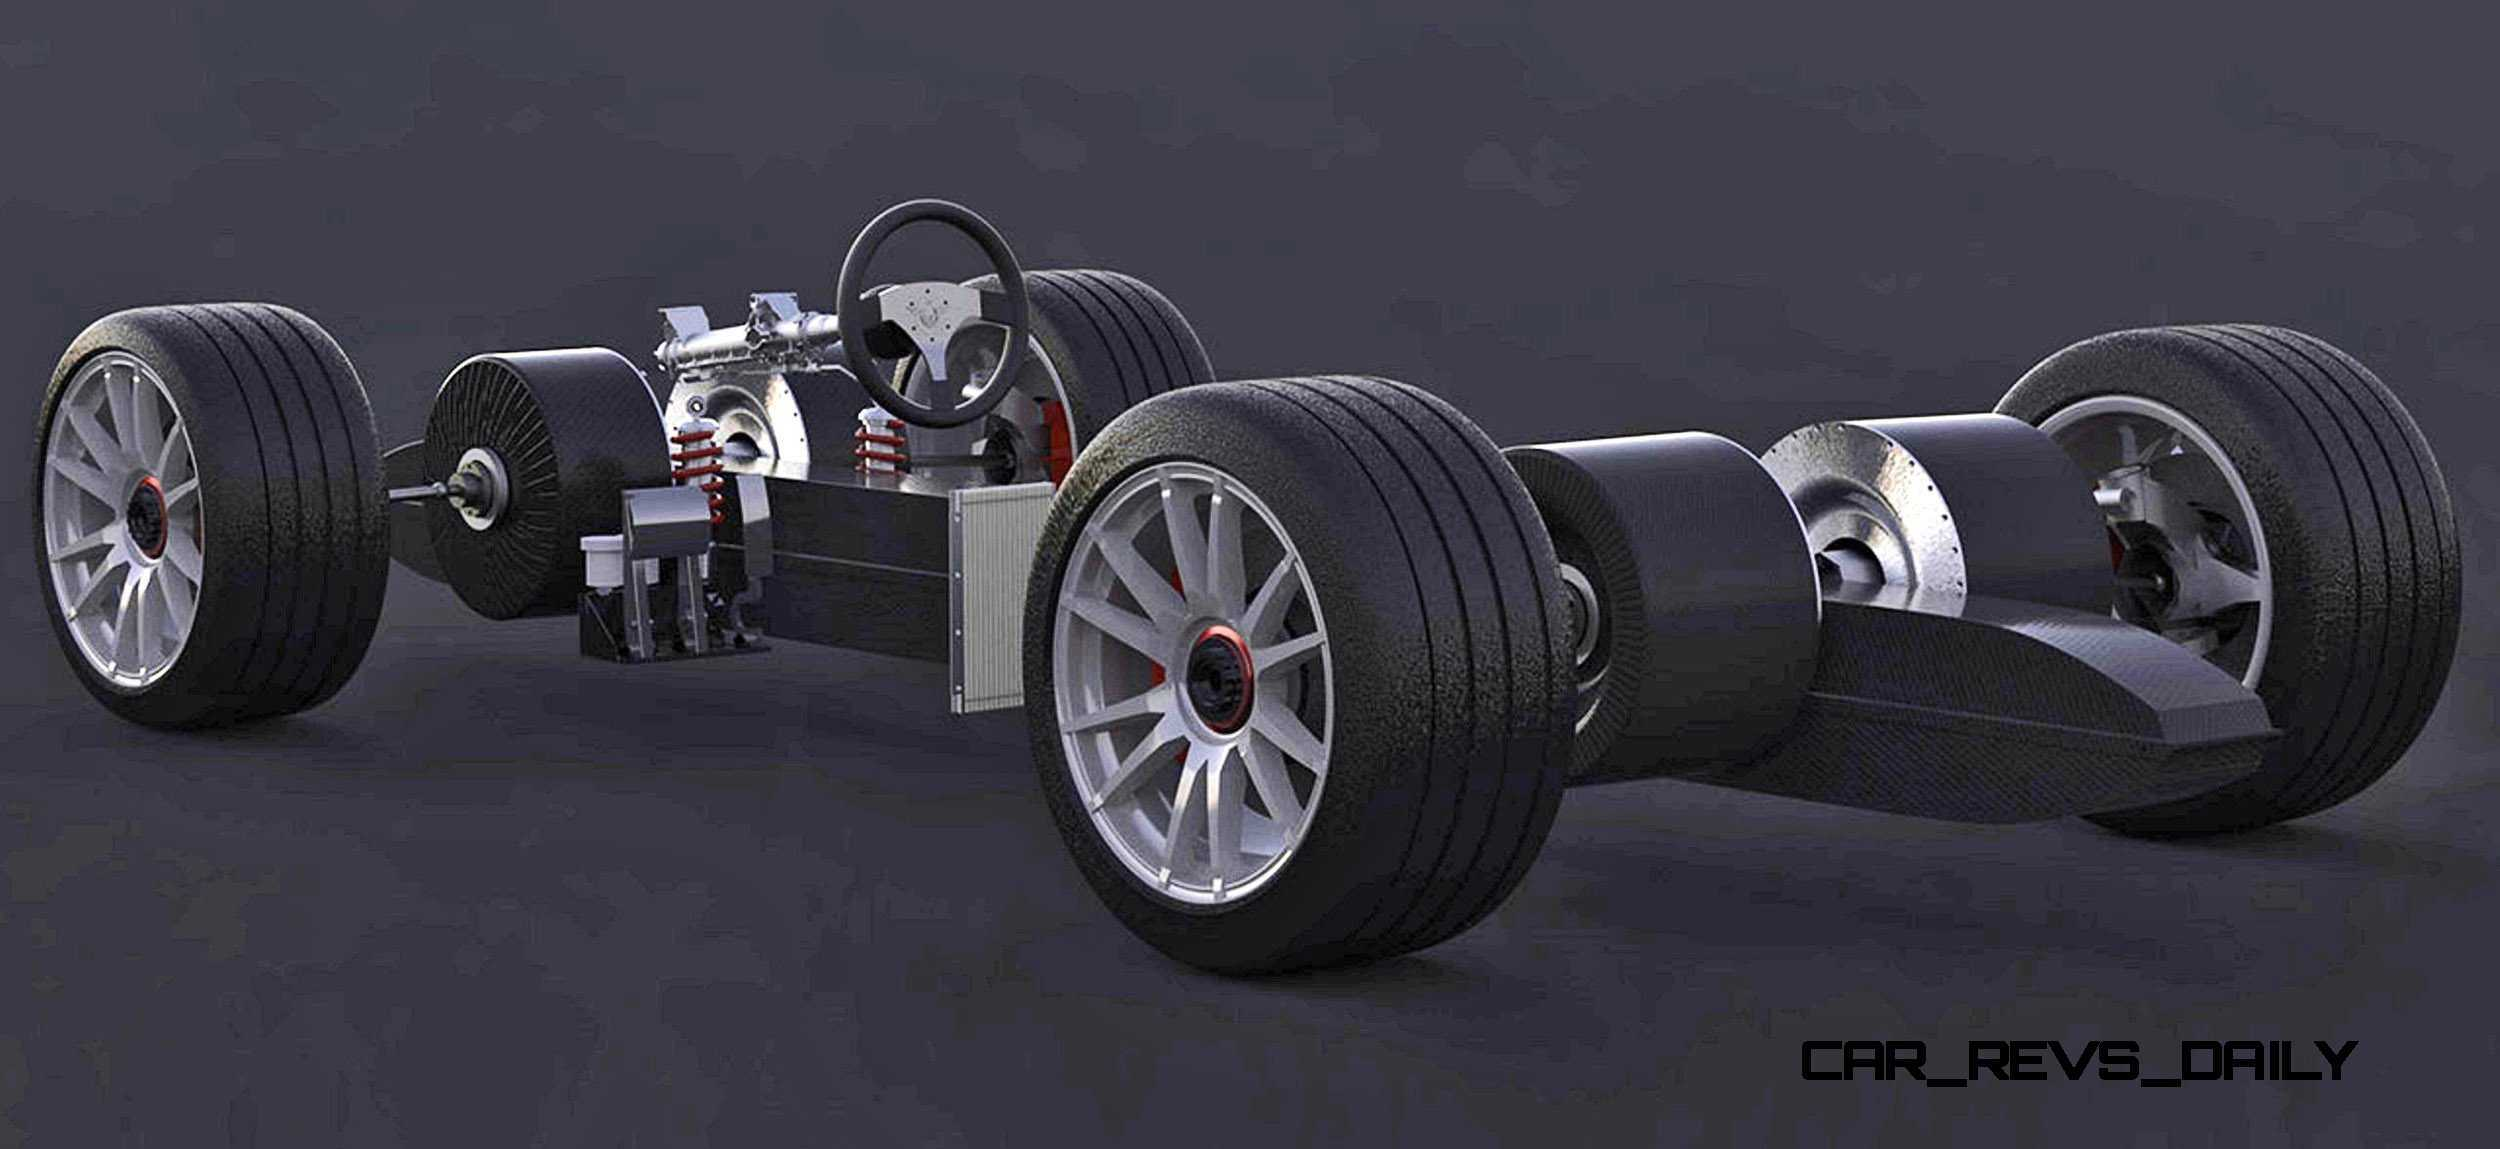 [Imagen: 2015-Toroidion-1MW-Concept-24.jpg]